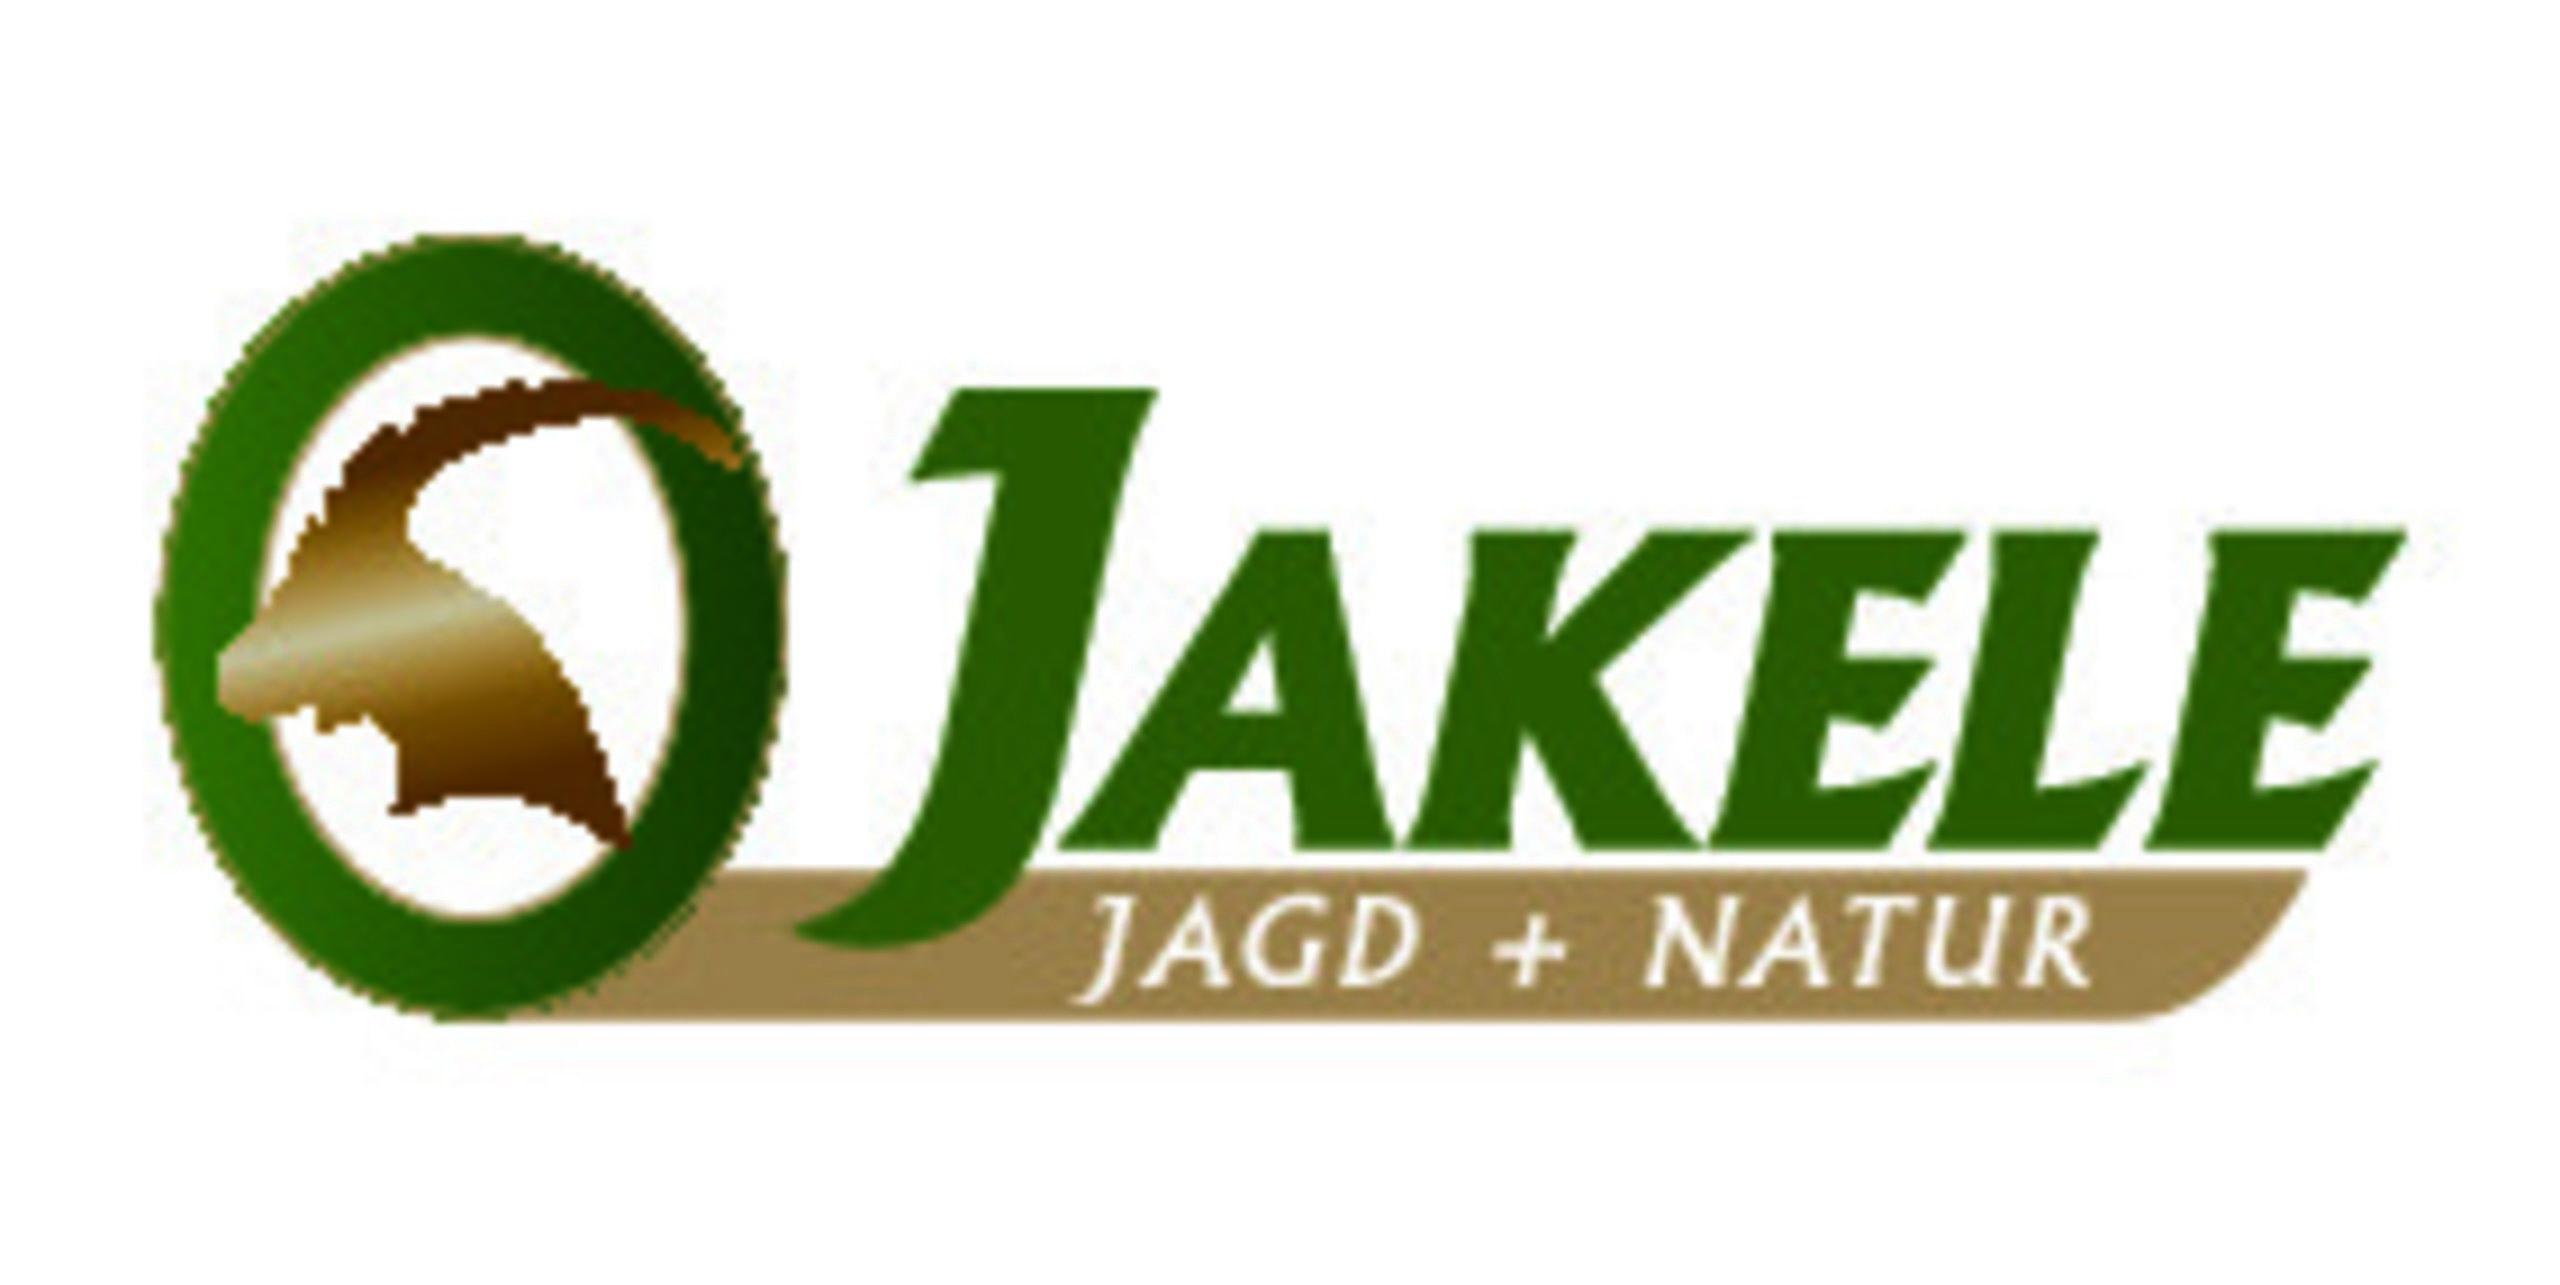 Jakele